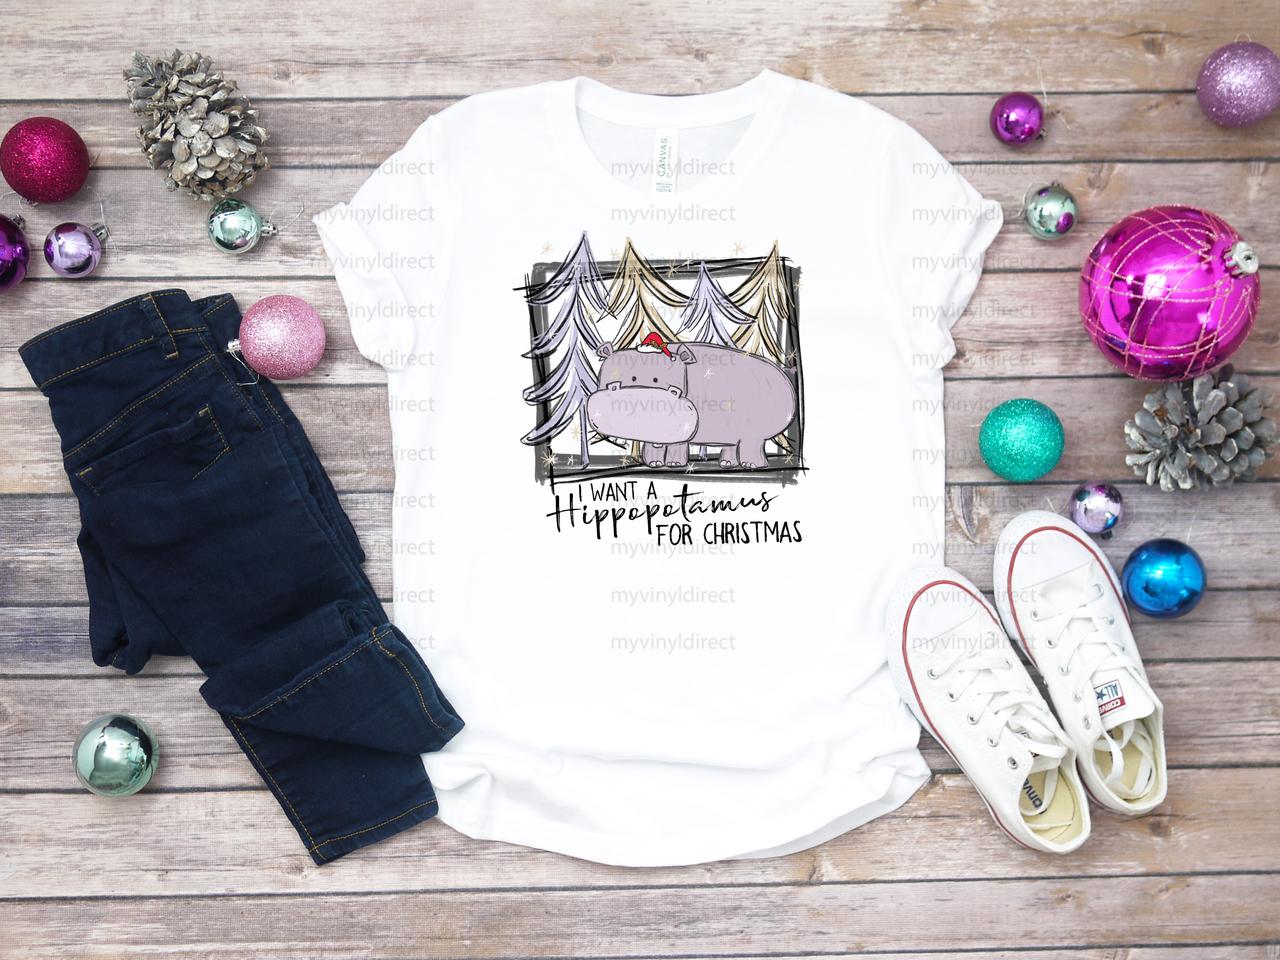 I Want Hippopotamus For Christmas.I Want A Hippopotamus For Christmas Cotton Transfer